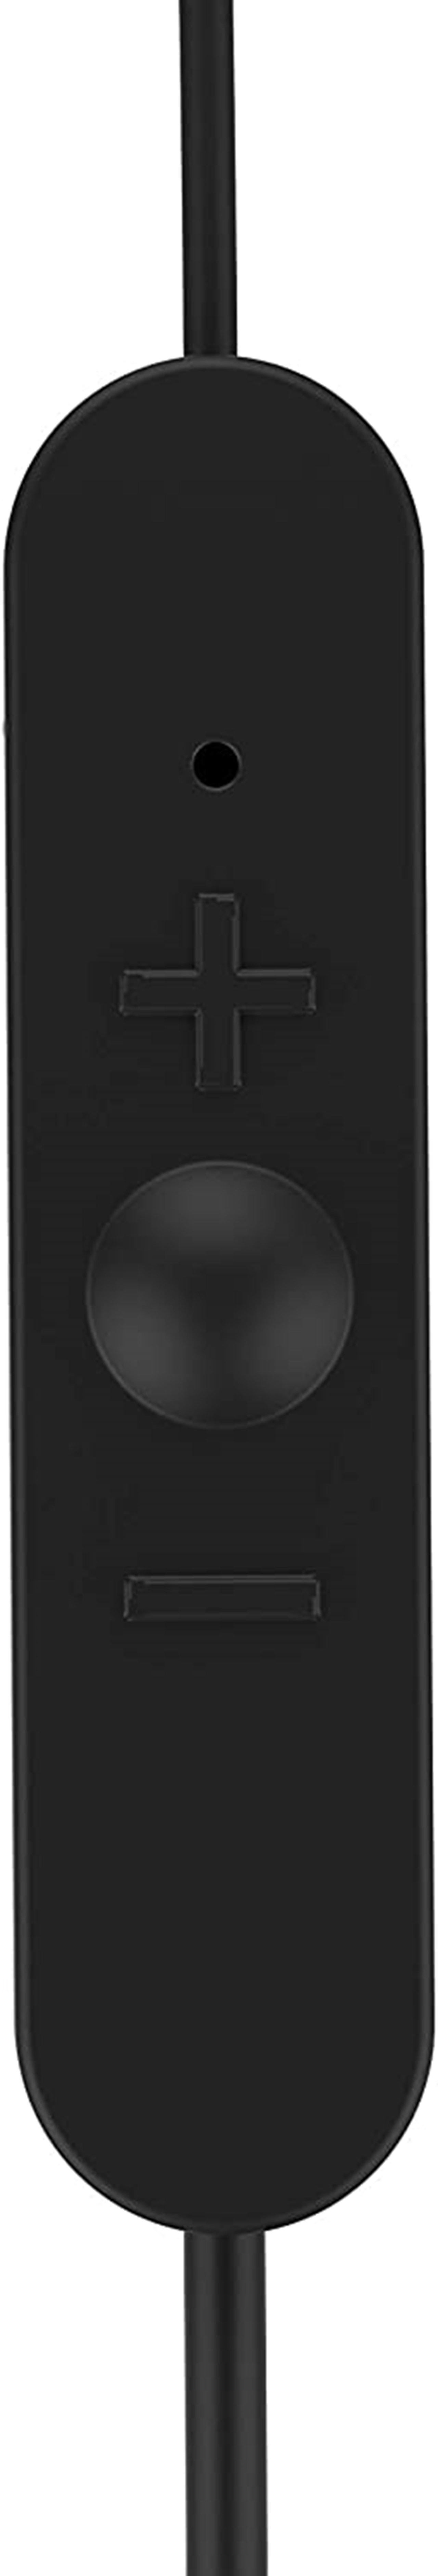 Klipsch R5 Black Bluetooth Earphones - 2